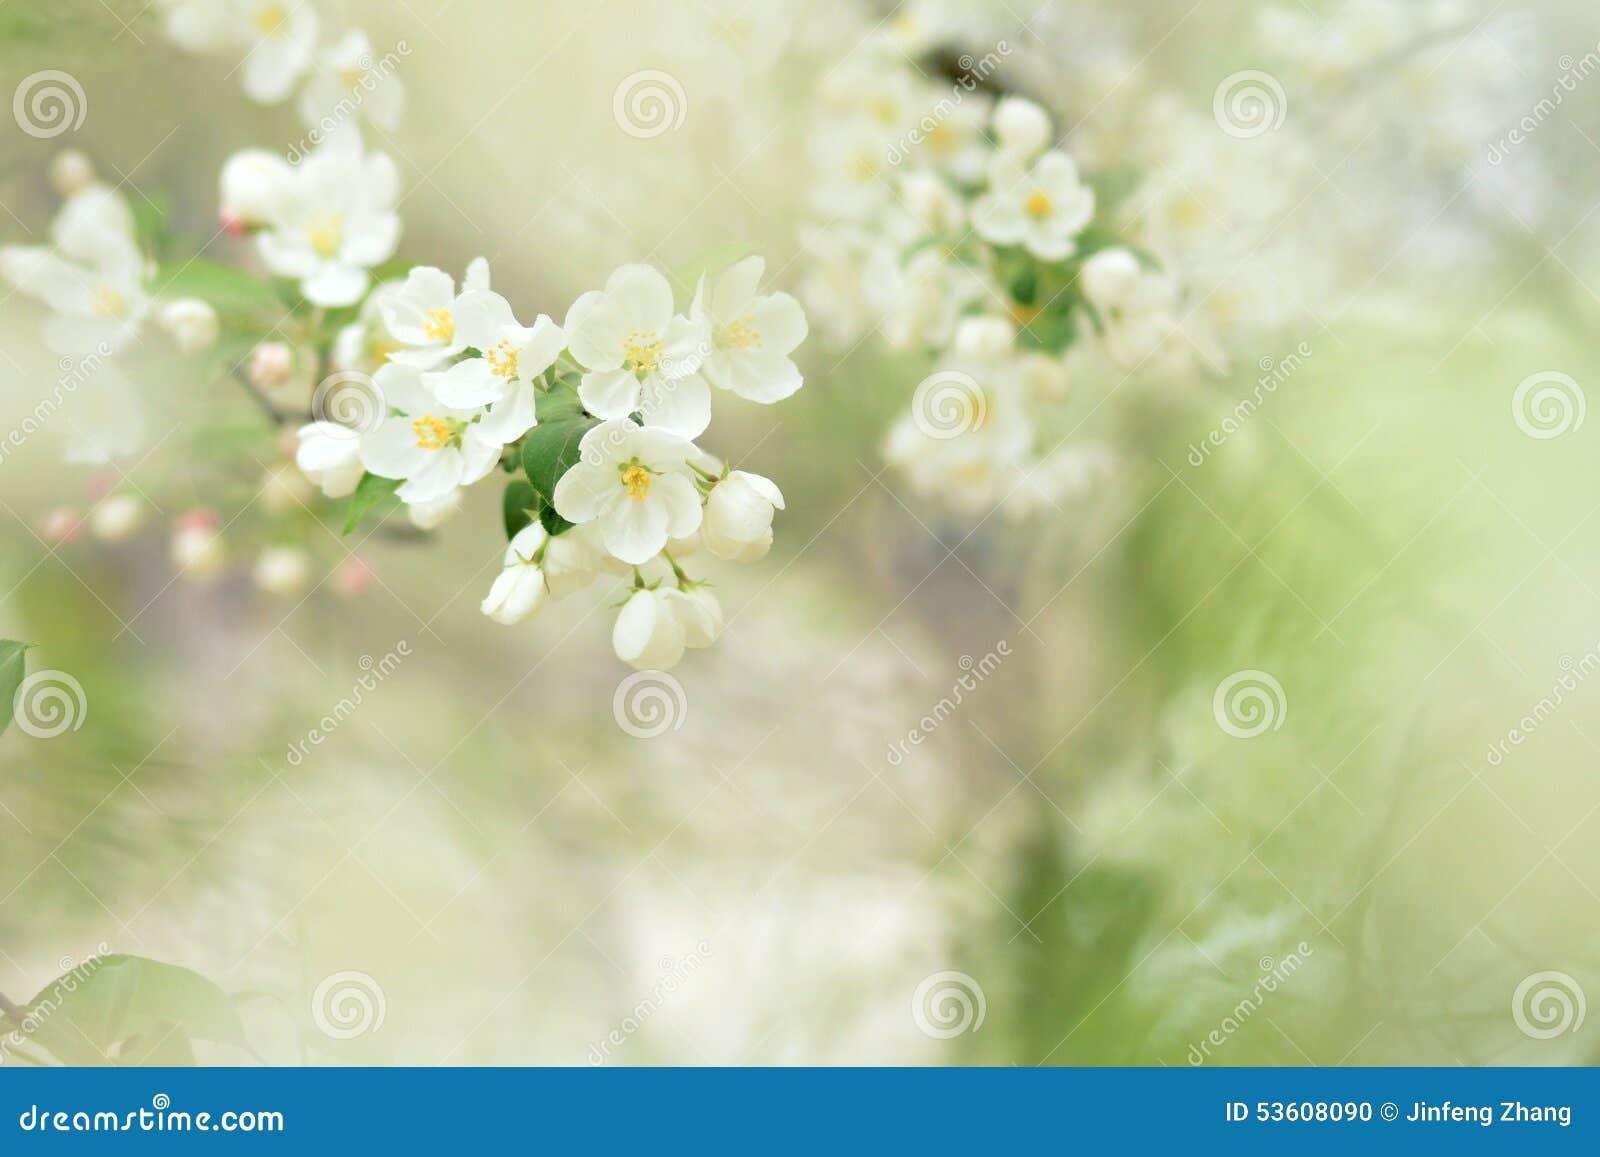 Chinese Flowering Crabapple Stock Photo Image Of Bloom White